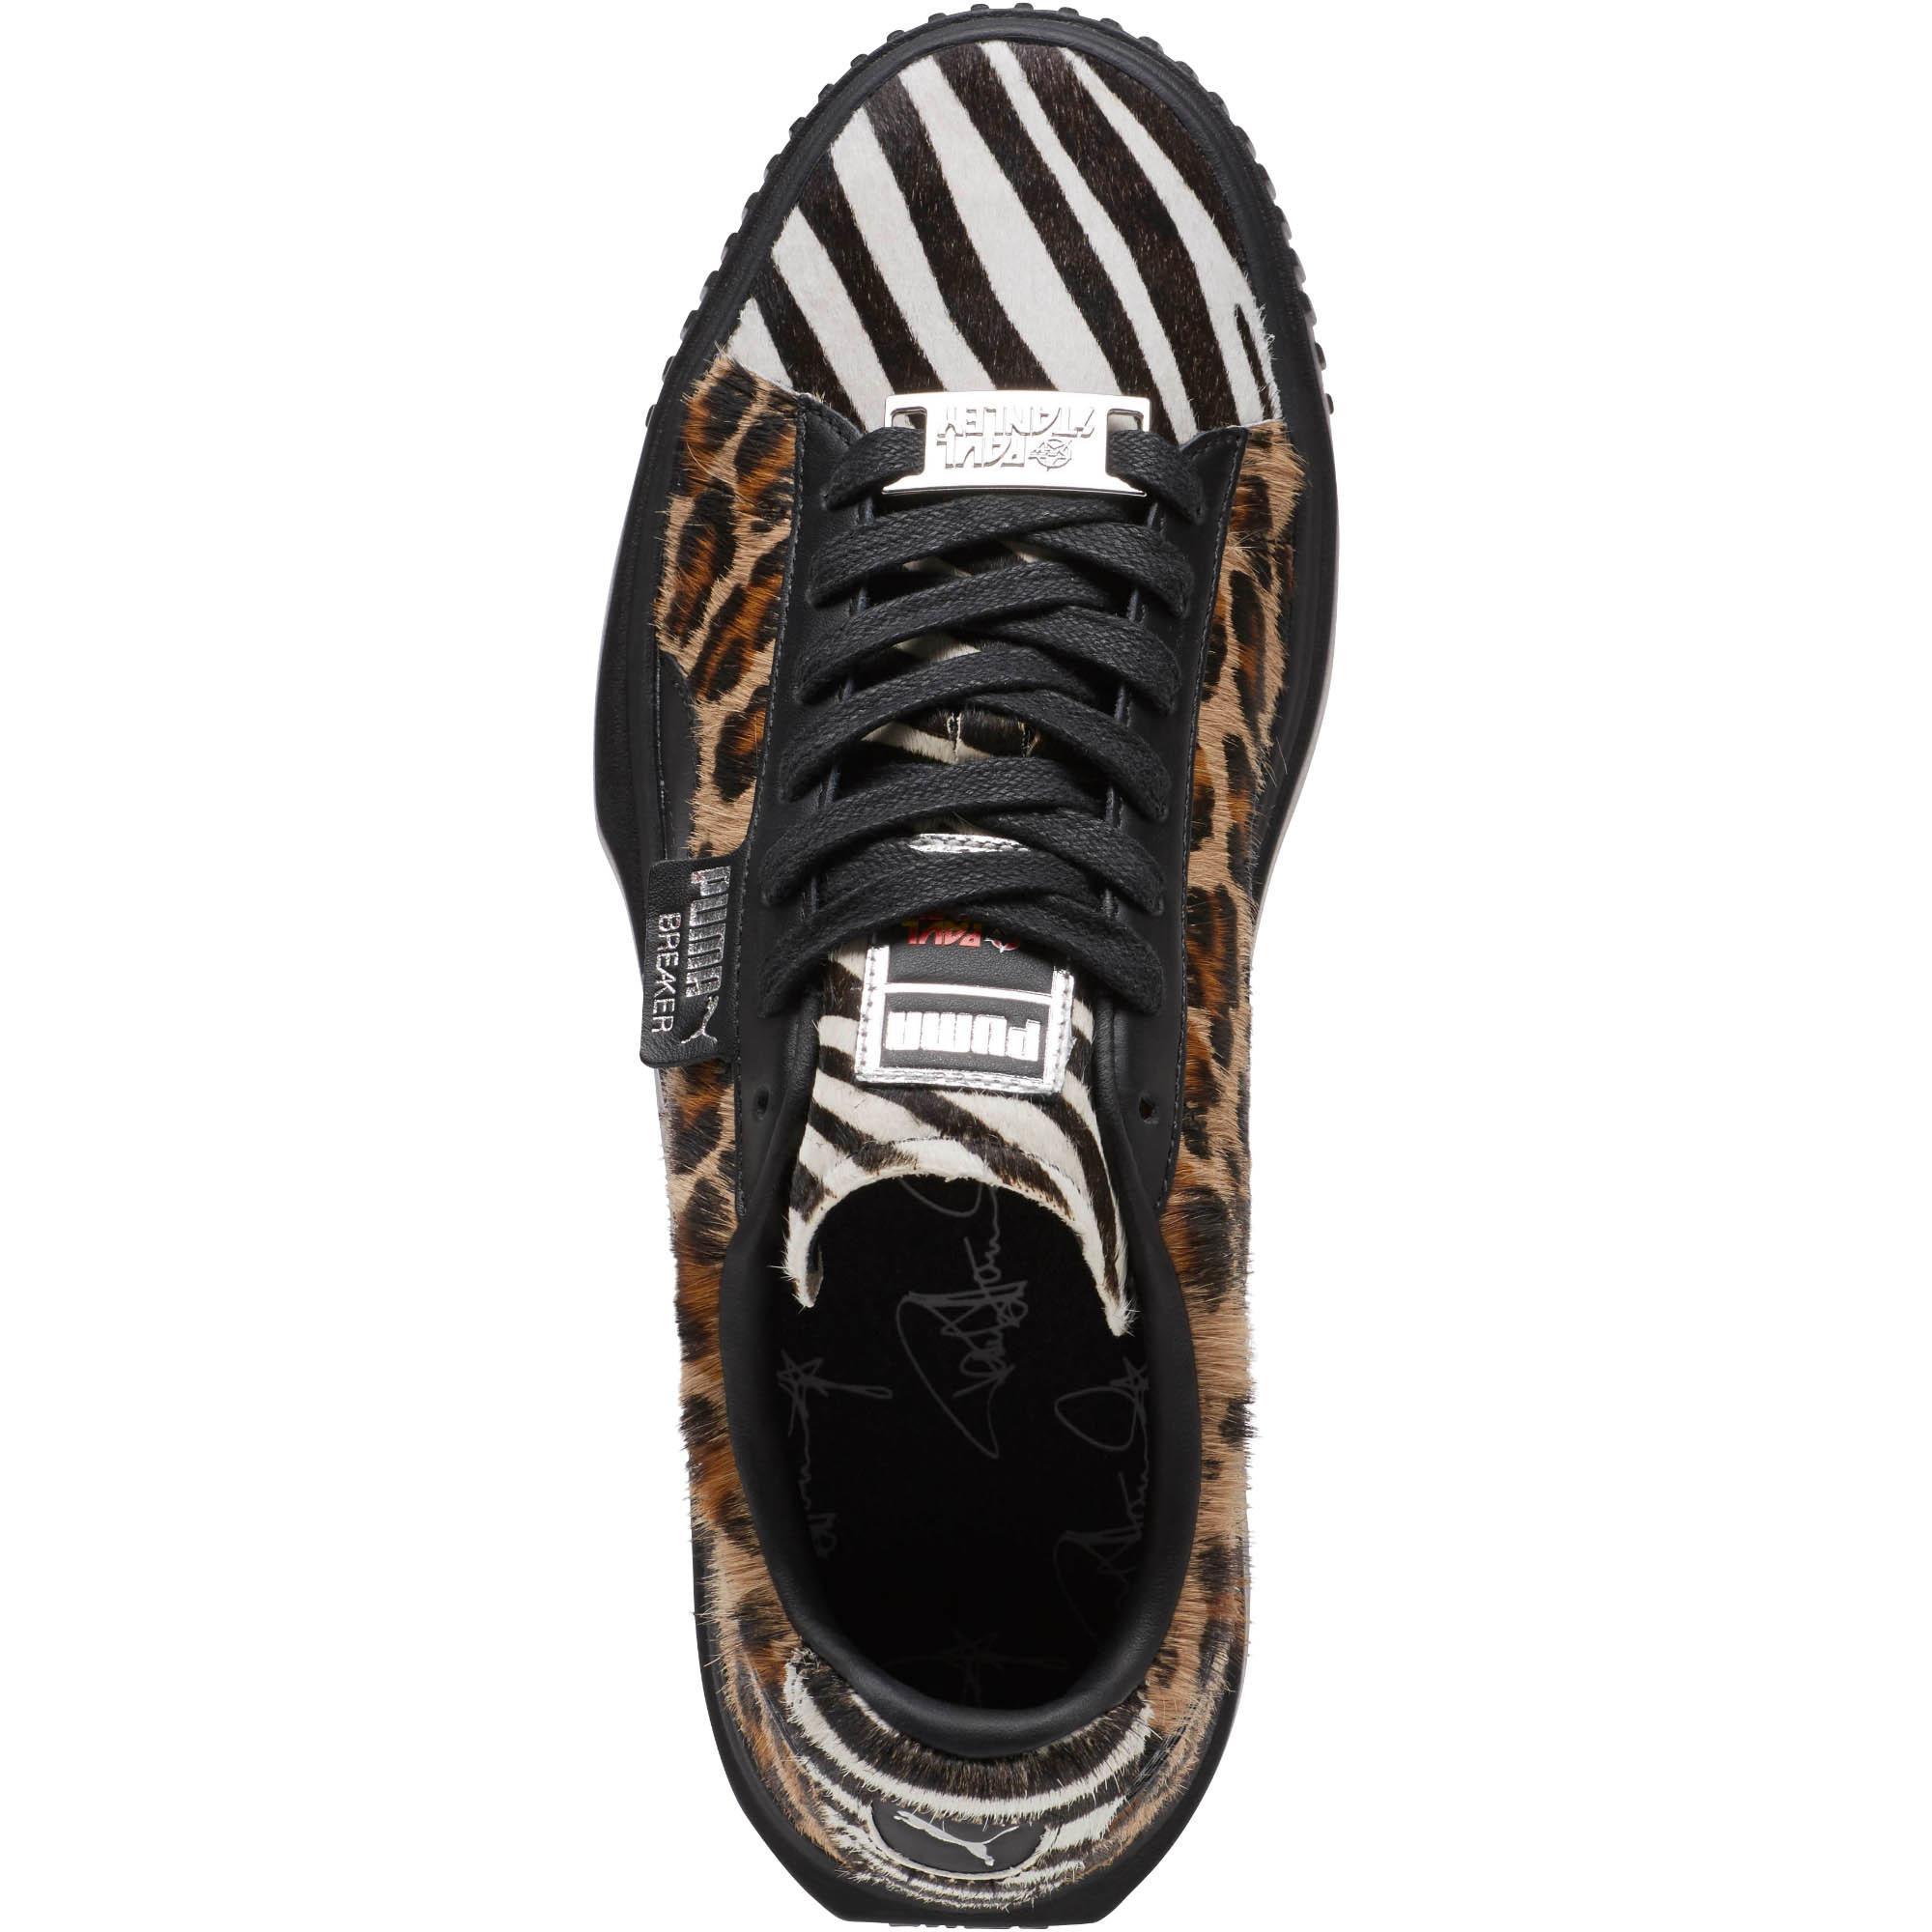 X Paul Stanley Breaker Men's Sneakers